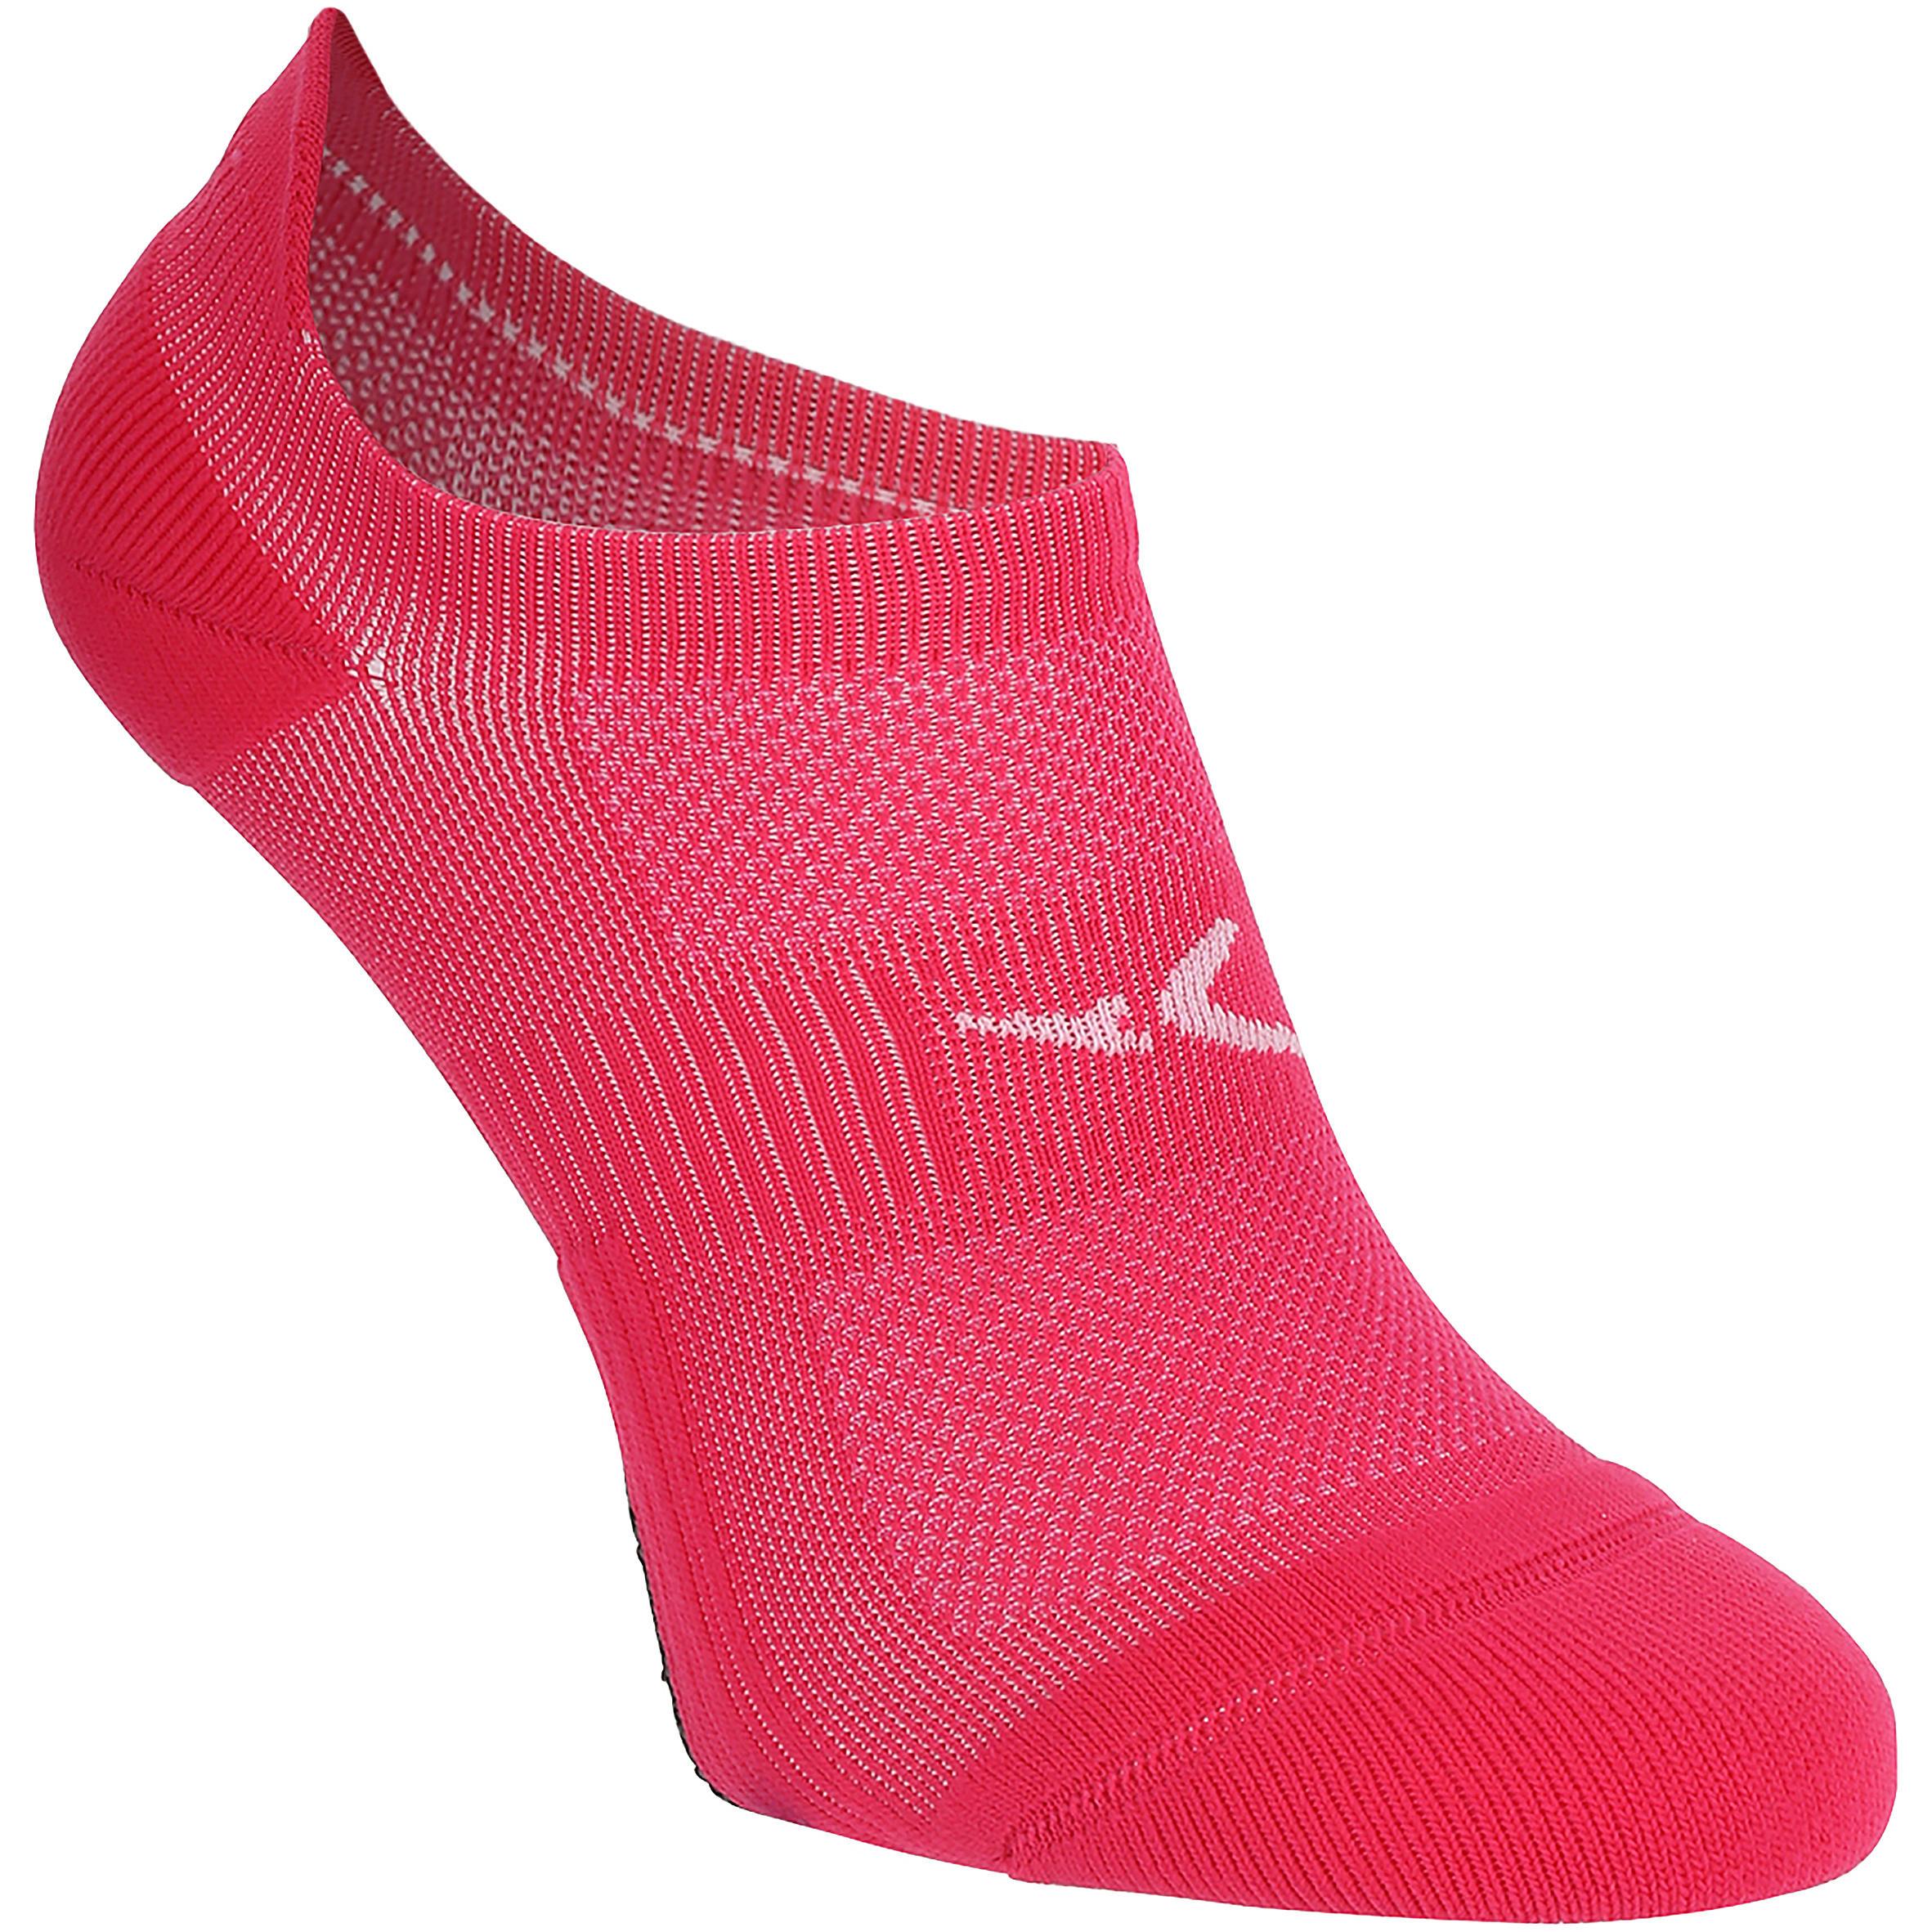 Sportsocken Invisible Fitness Cardio 2er-Pack rosa | Sportbekleidung > Funktionswäsche > Sportsocken | Rosa | Domyos